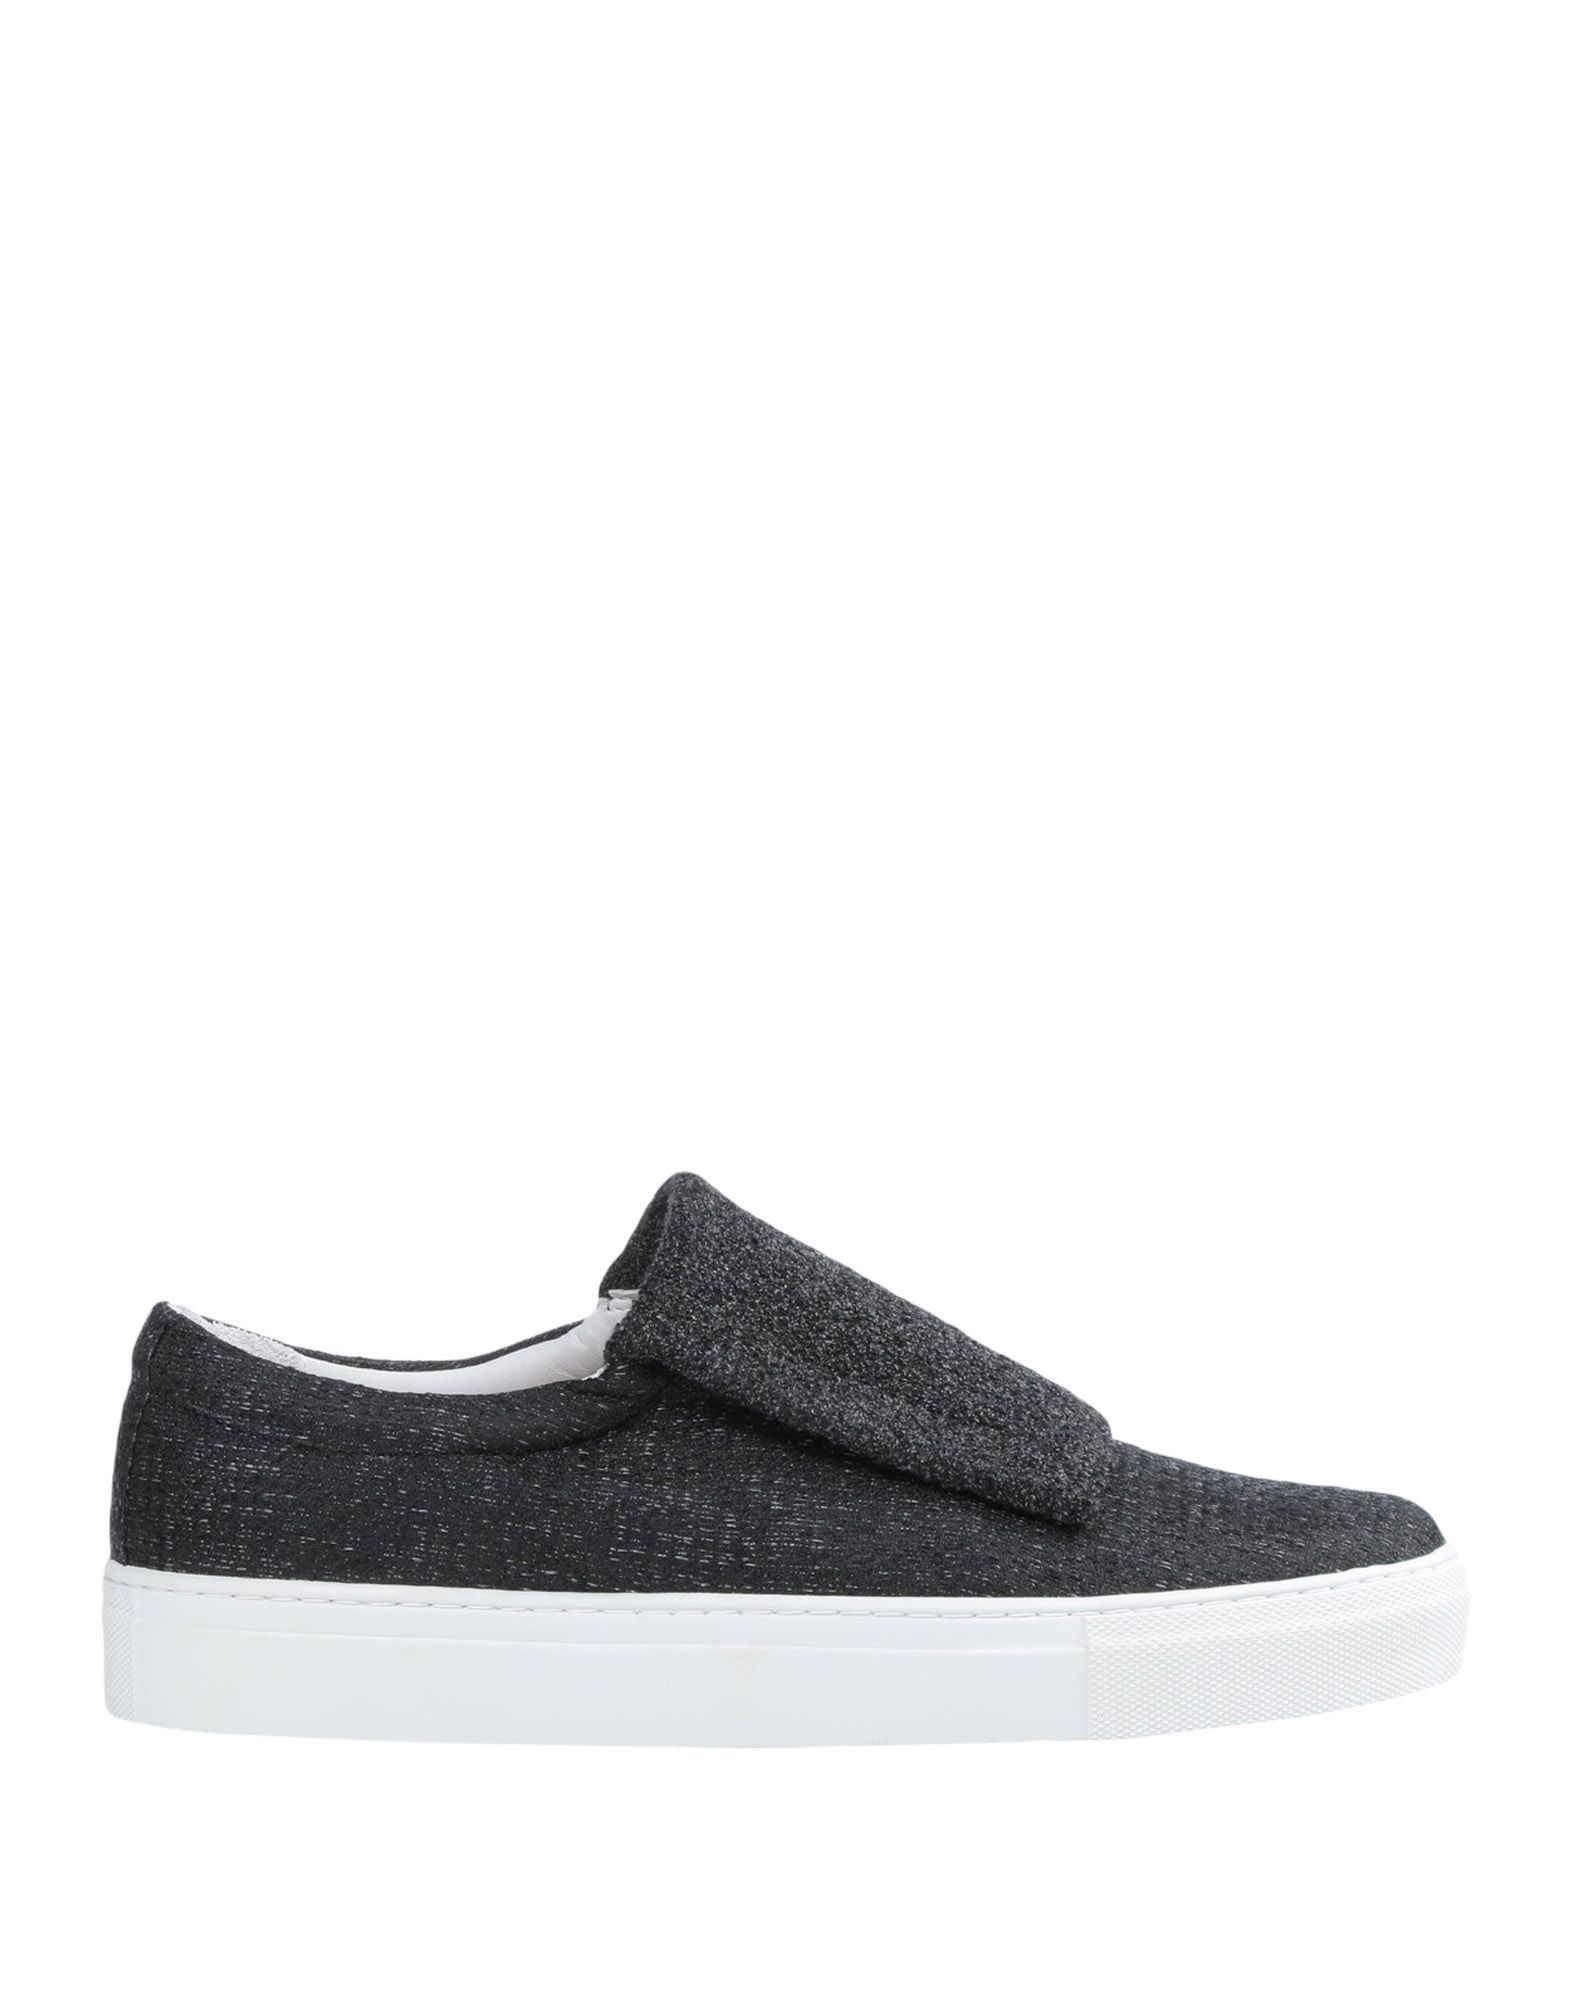 Primury Sneakers Gute Damen  11520668SM Gute Sneakers Qualität beliebte Schuhe 0bed7b